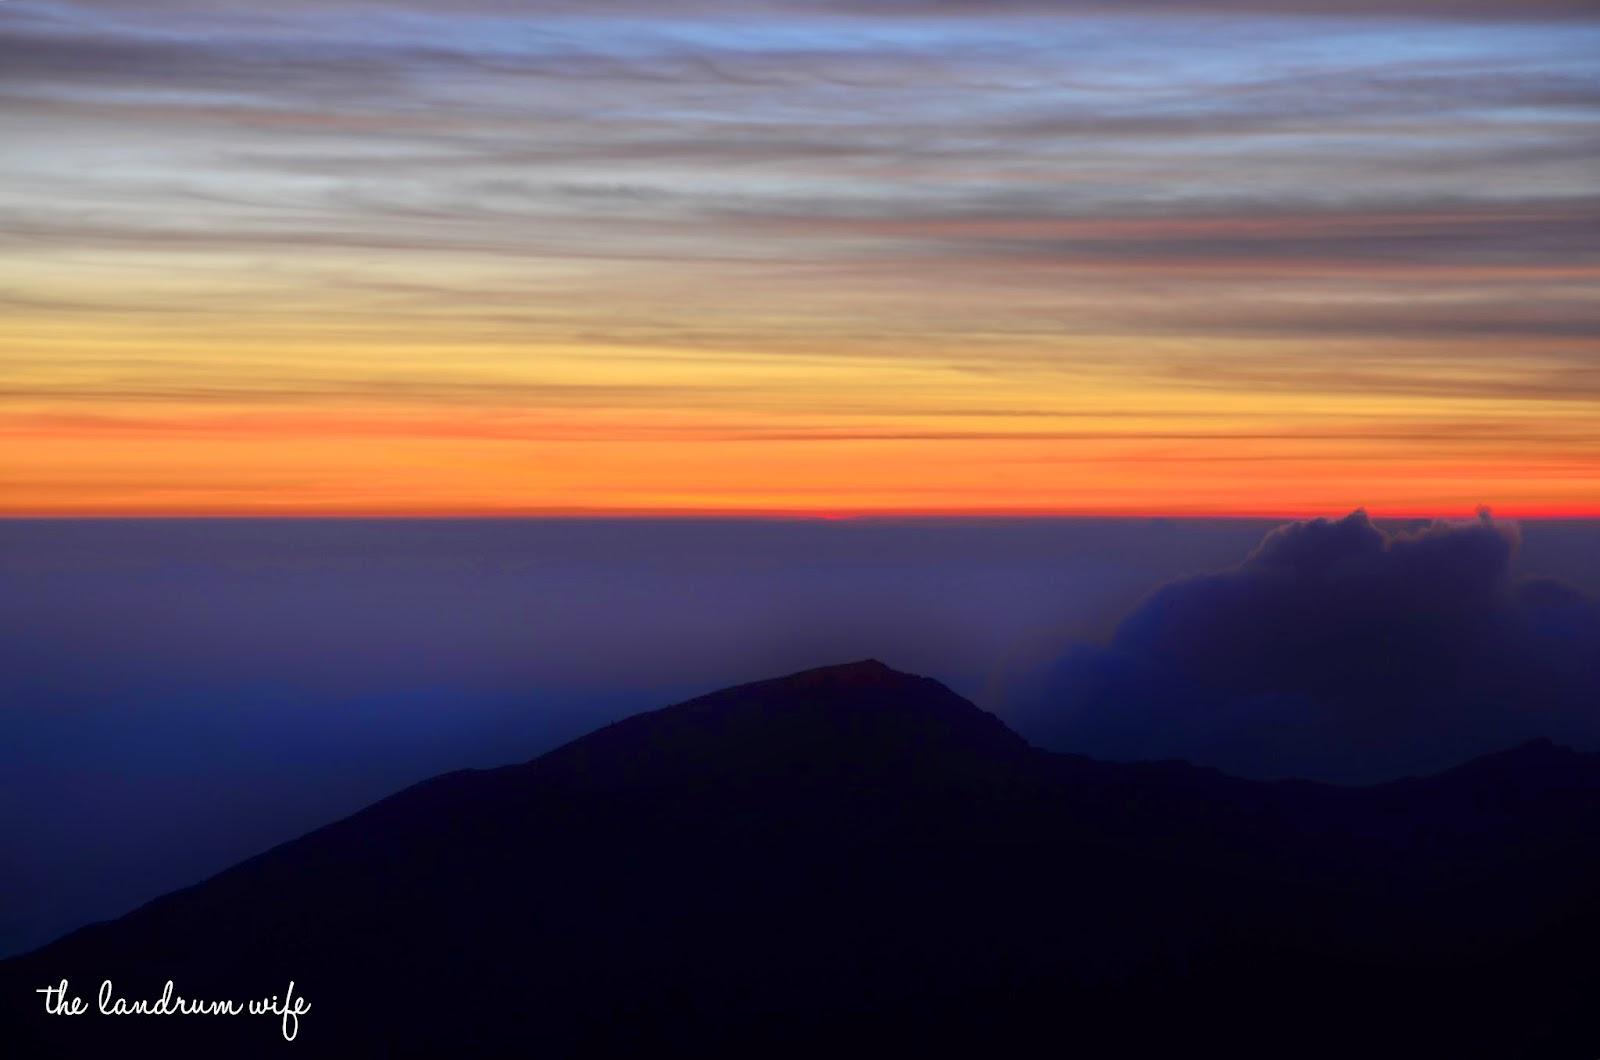 Haleakala Crater, Haleakala National Park: Address, Phone Number, Haleakala Crater Reviews: 5/5